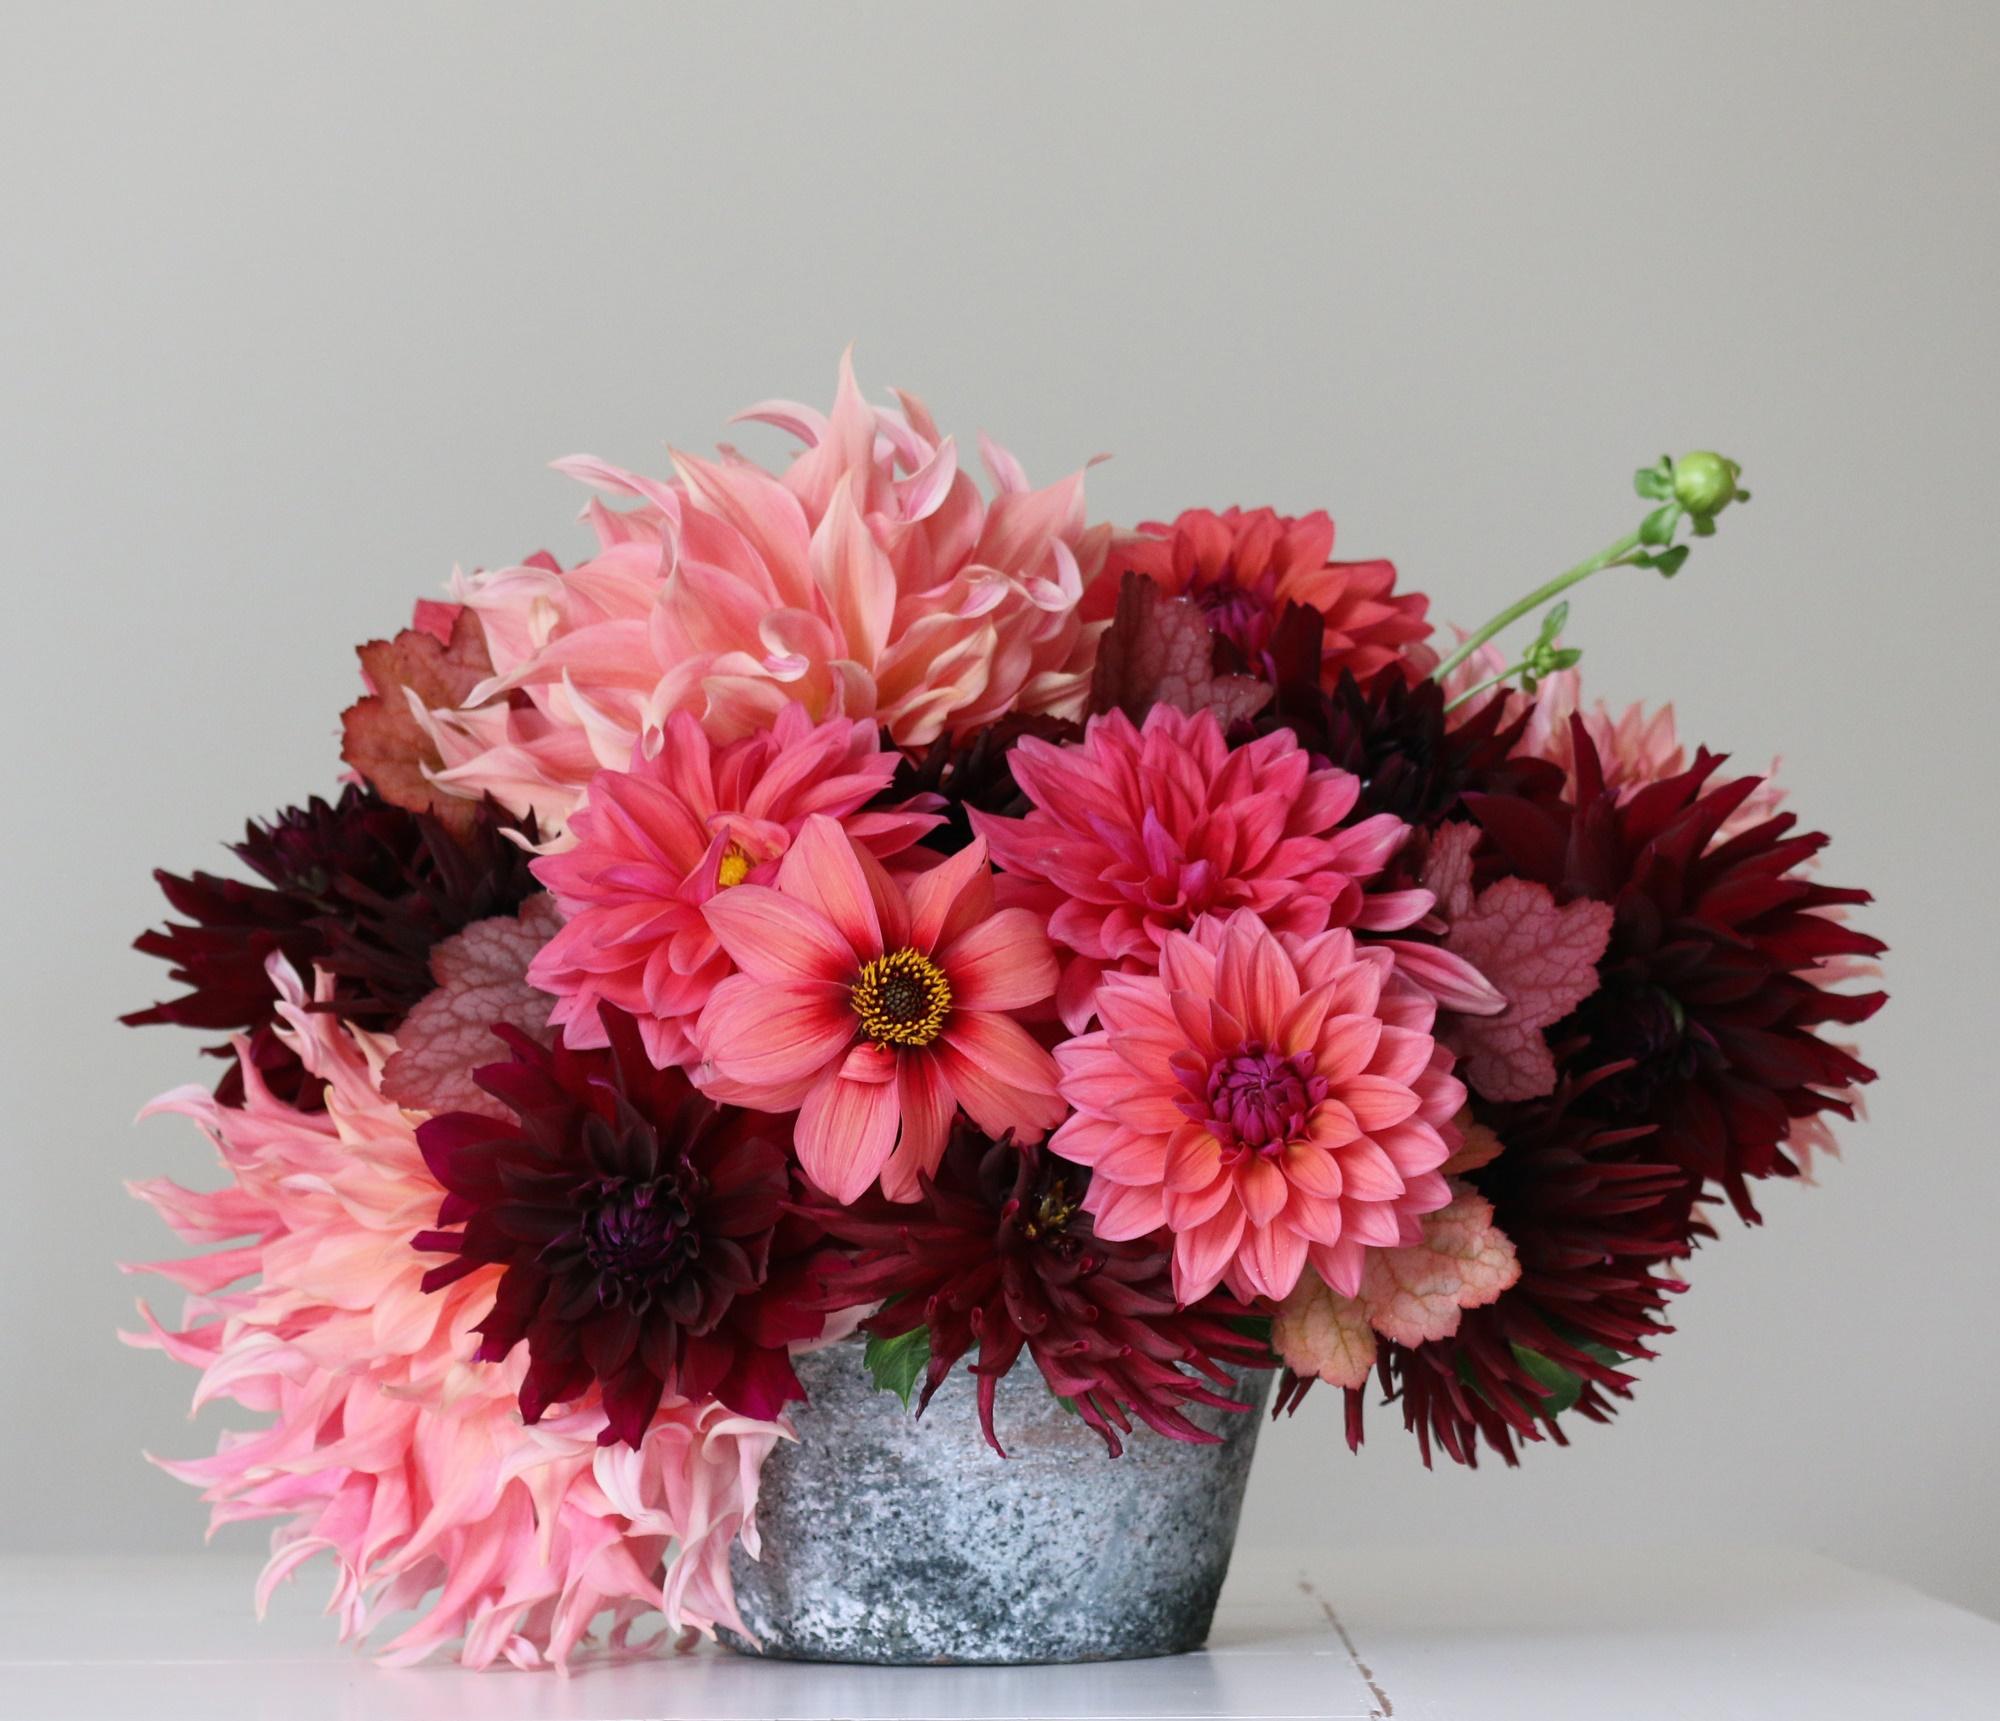 2_Flirty Fleurs Sorbetto Dahlia Collection - Longfield Gardens.jpg